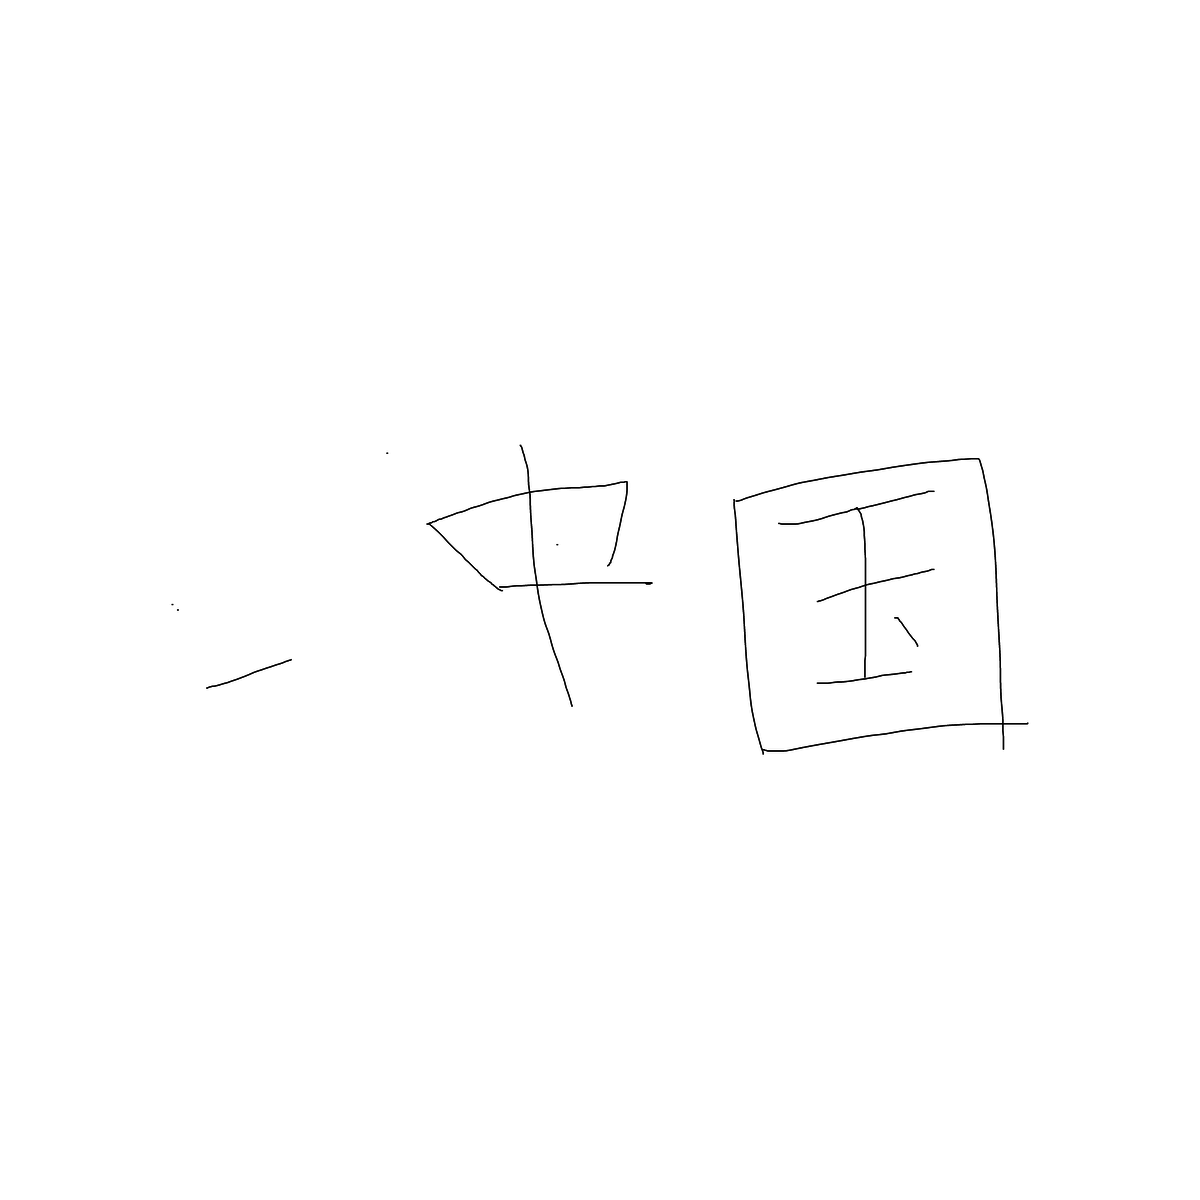 BAAAM drawing#1379 lat:24.1353130340576170lng: 120.7050399780273400